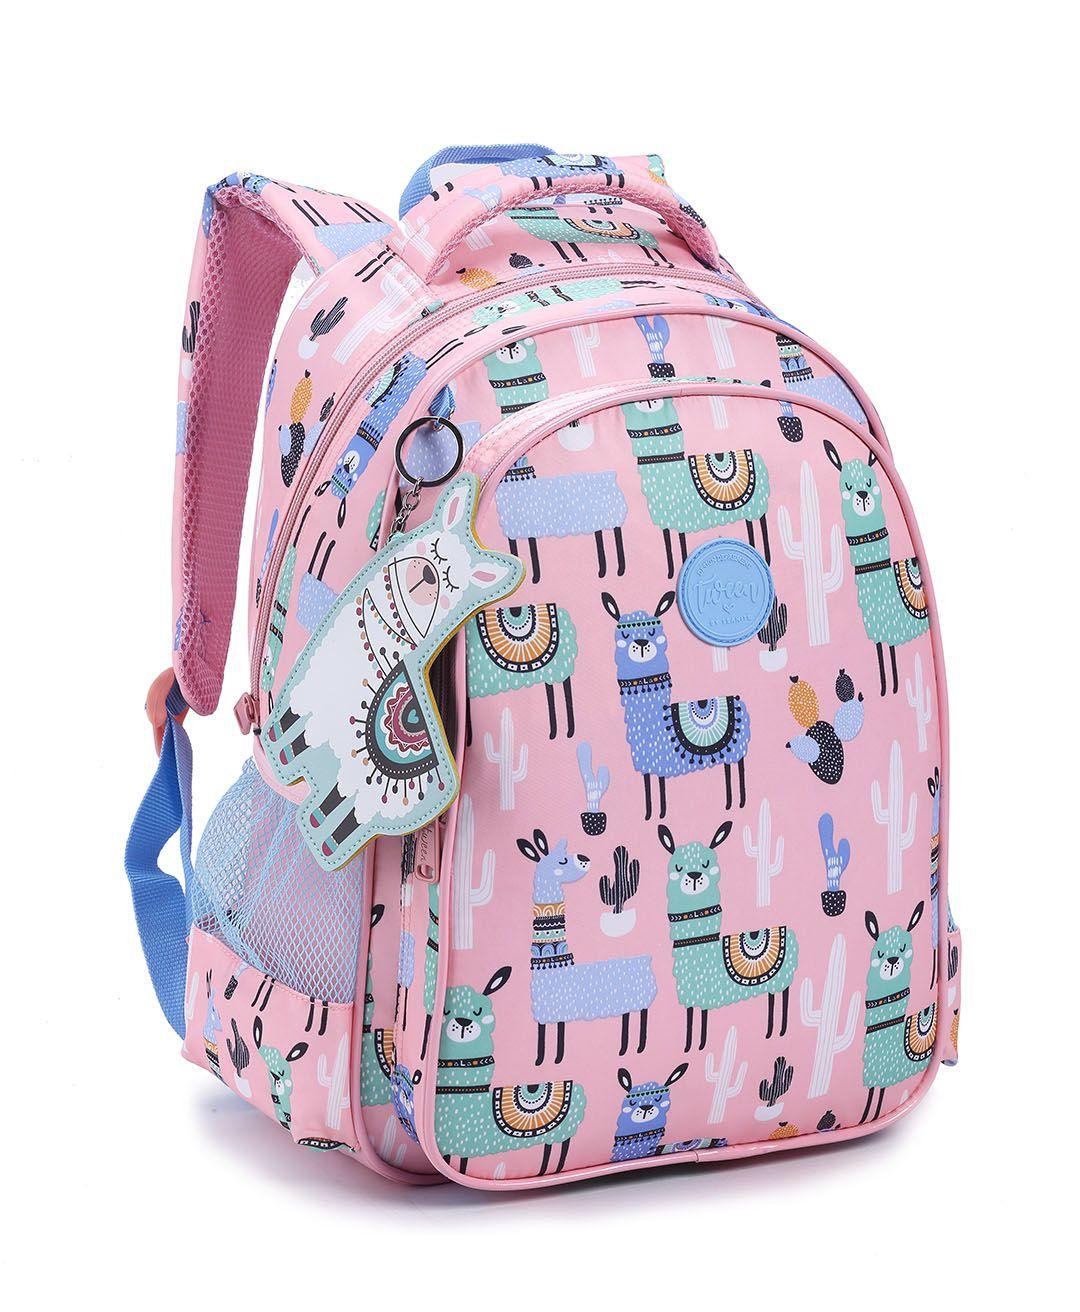 Mochila Feminina Backpack Com Chaveiro Seanite lhama